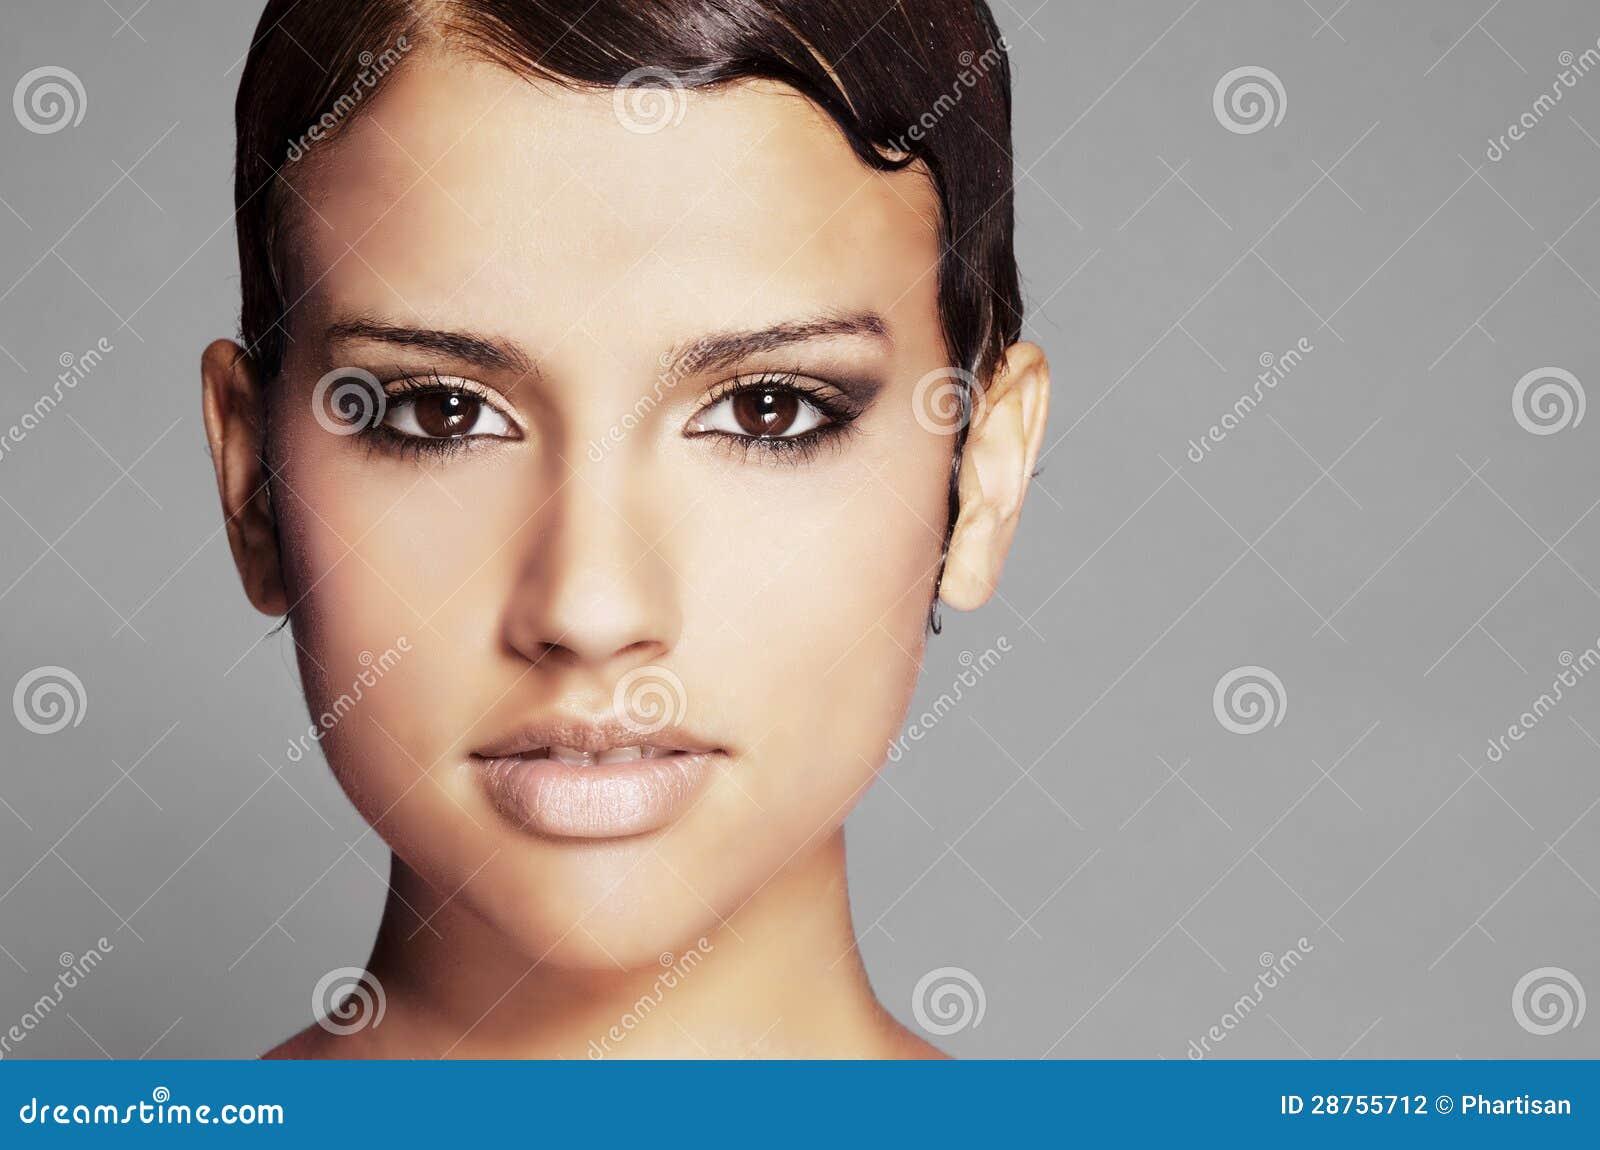 She?) it's Professional make short facial hair she